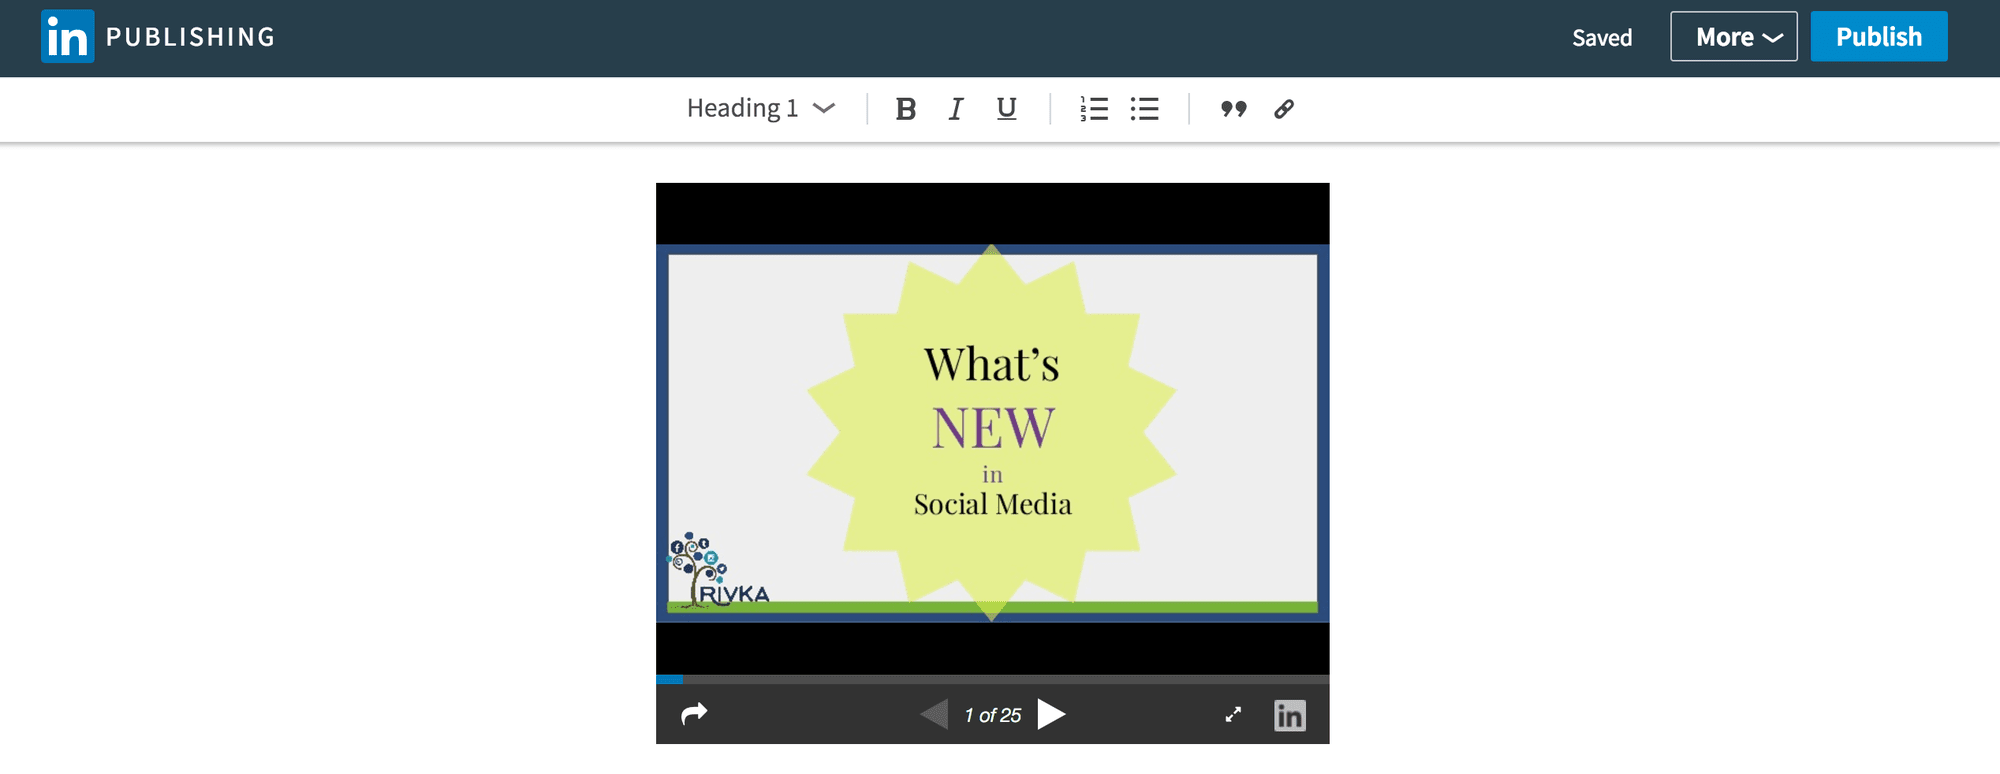 LinkedIn Publishing Slides with Slideshare